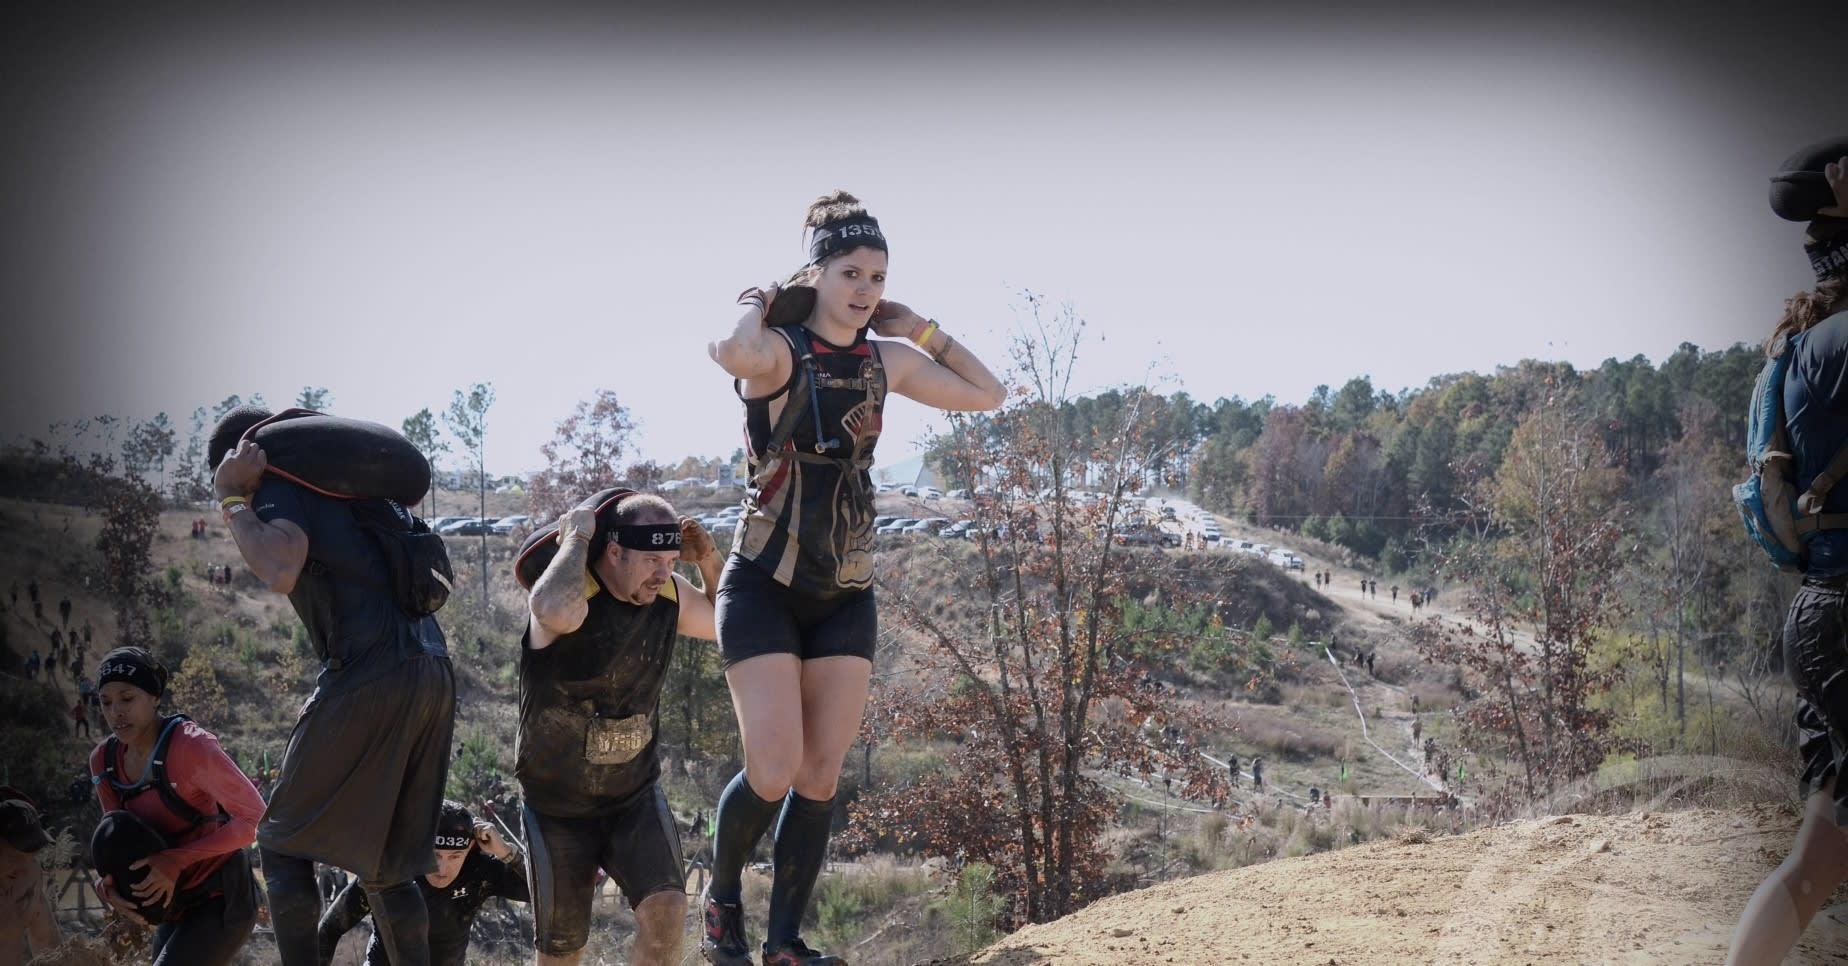 Spartan Race - Carolinas - Ultra, Beast, and Sprint Weekend